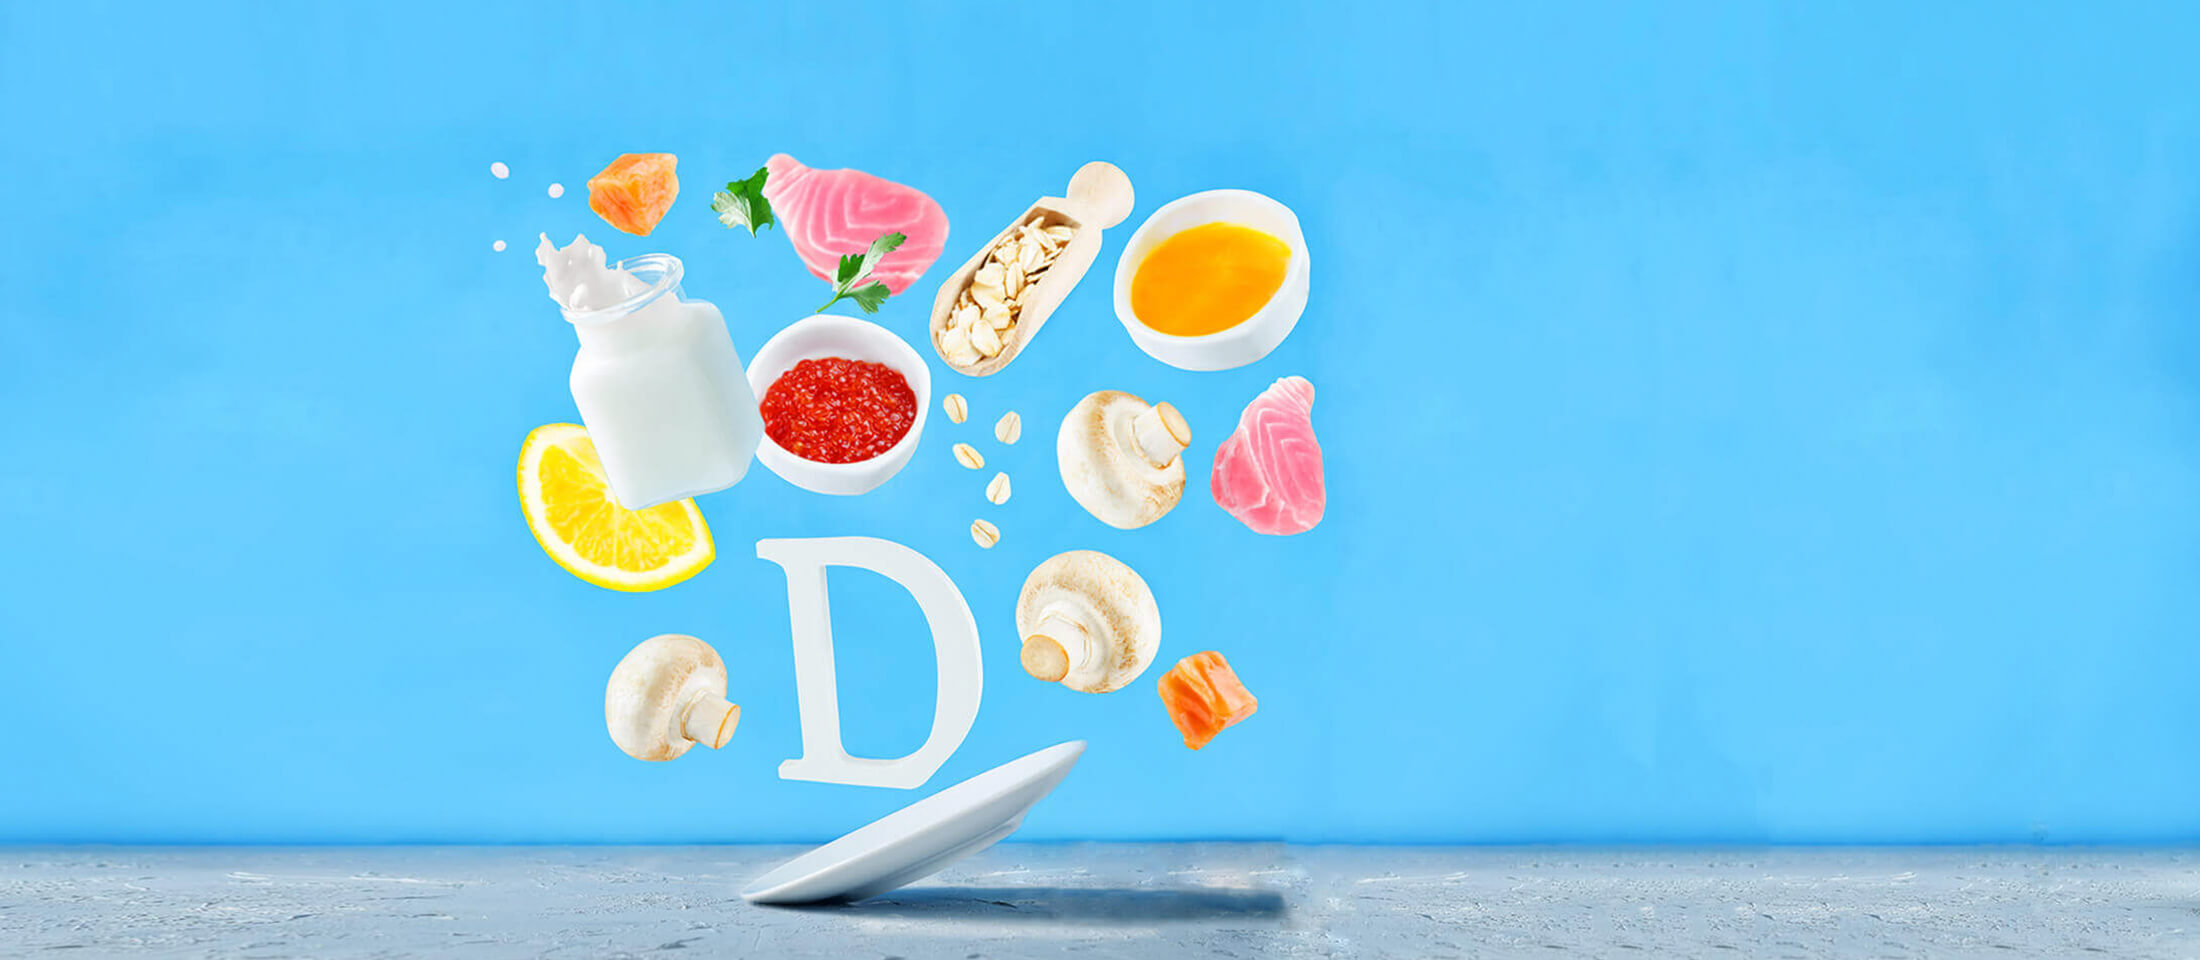 slider-vitamin-d-3